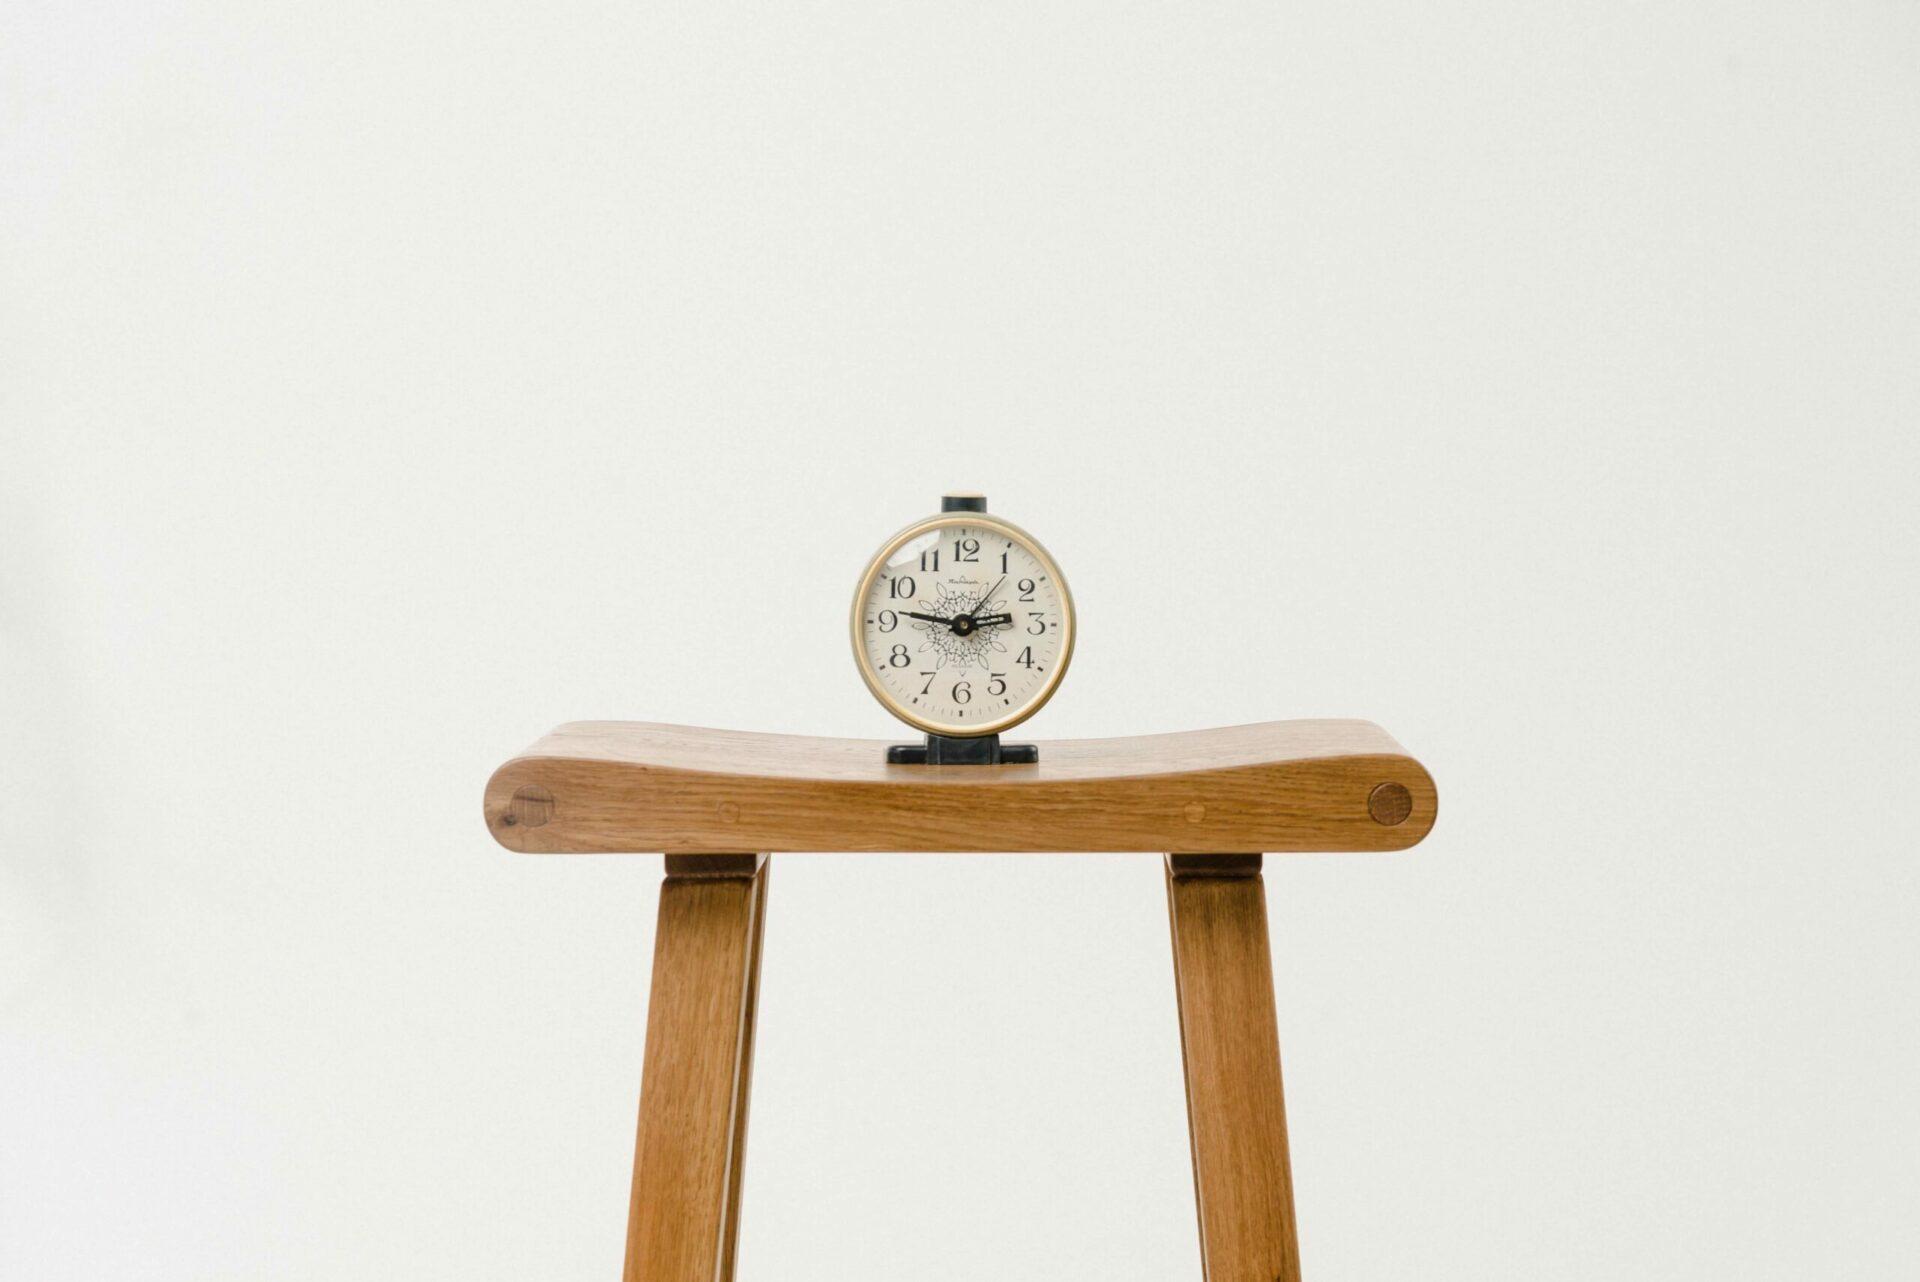 An alarm clock sitting on a stool